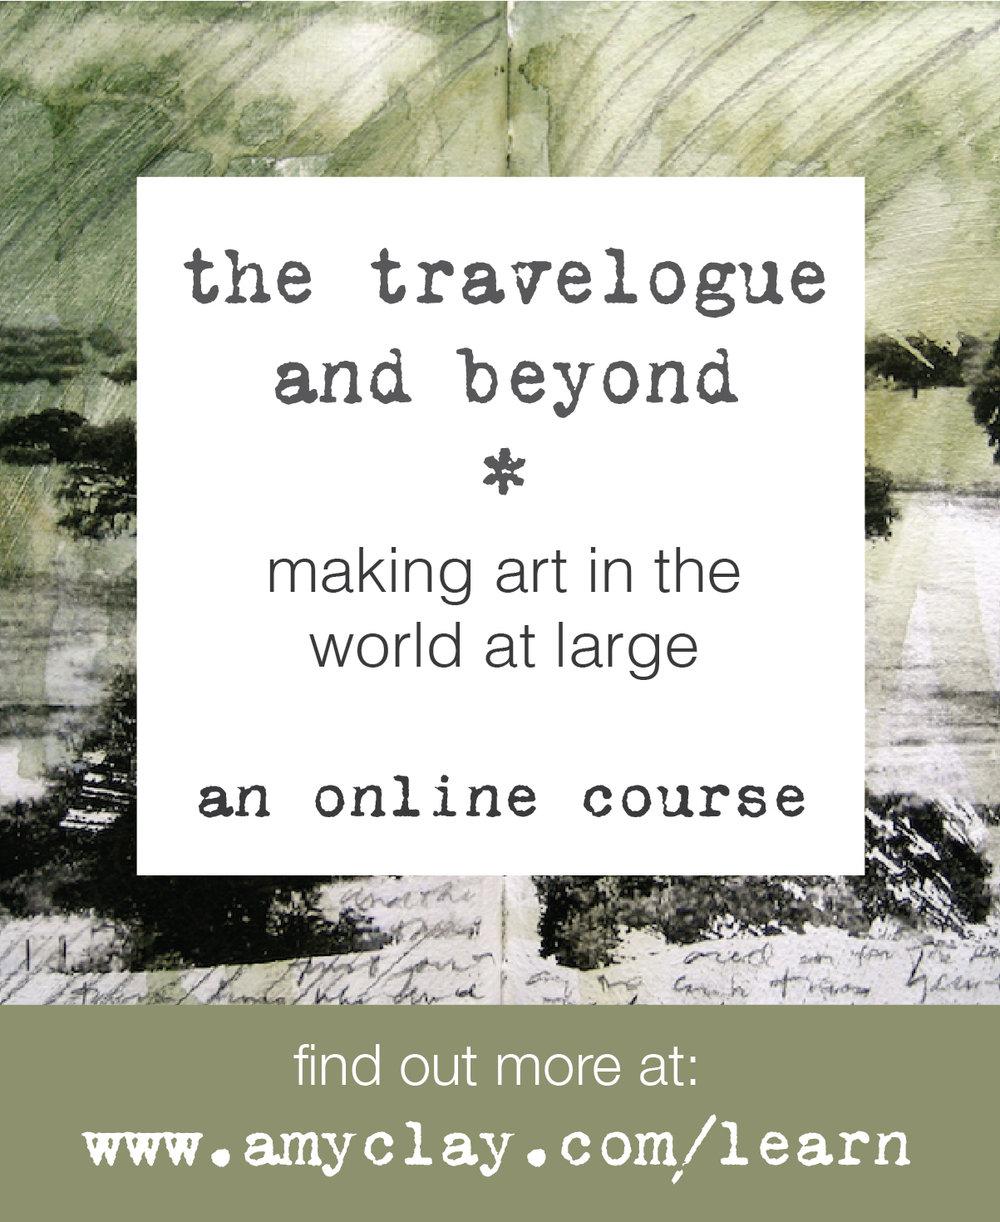 amy clay travelogue class.jpg